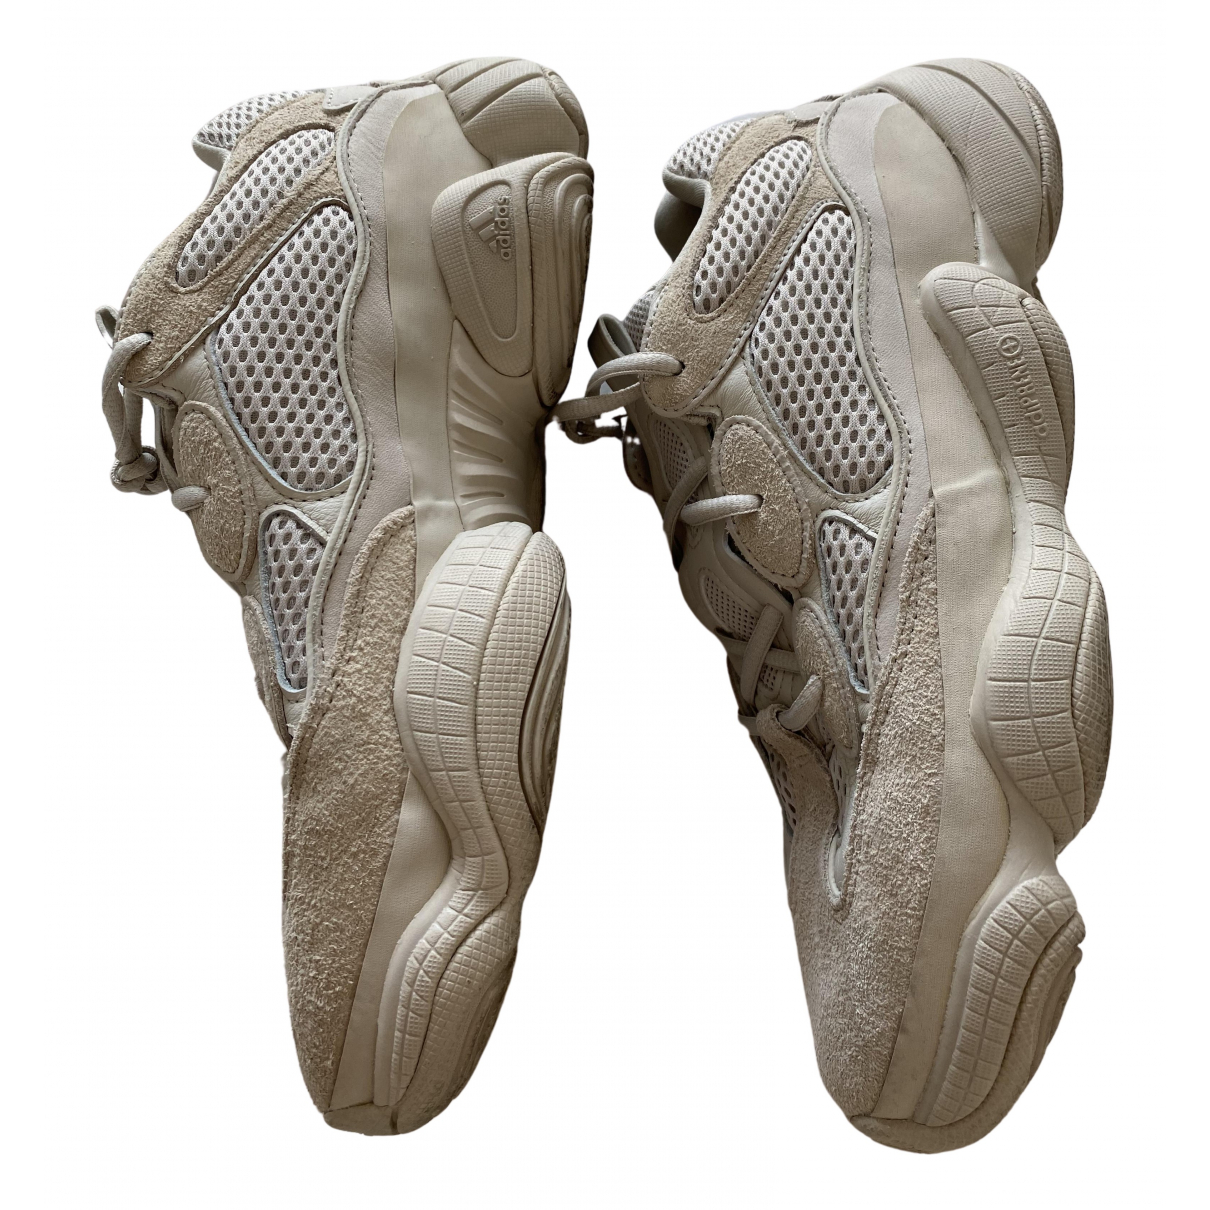 Yeezy X Adidas - Baskets 500 pour homme en suede - ecru